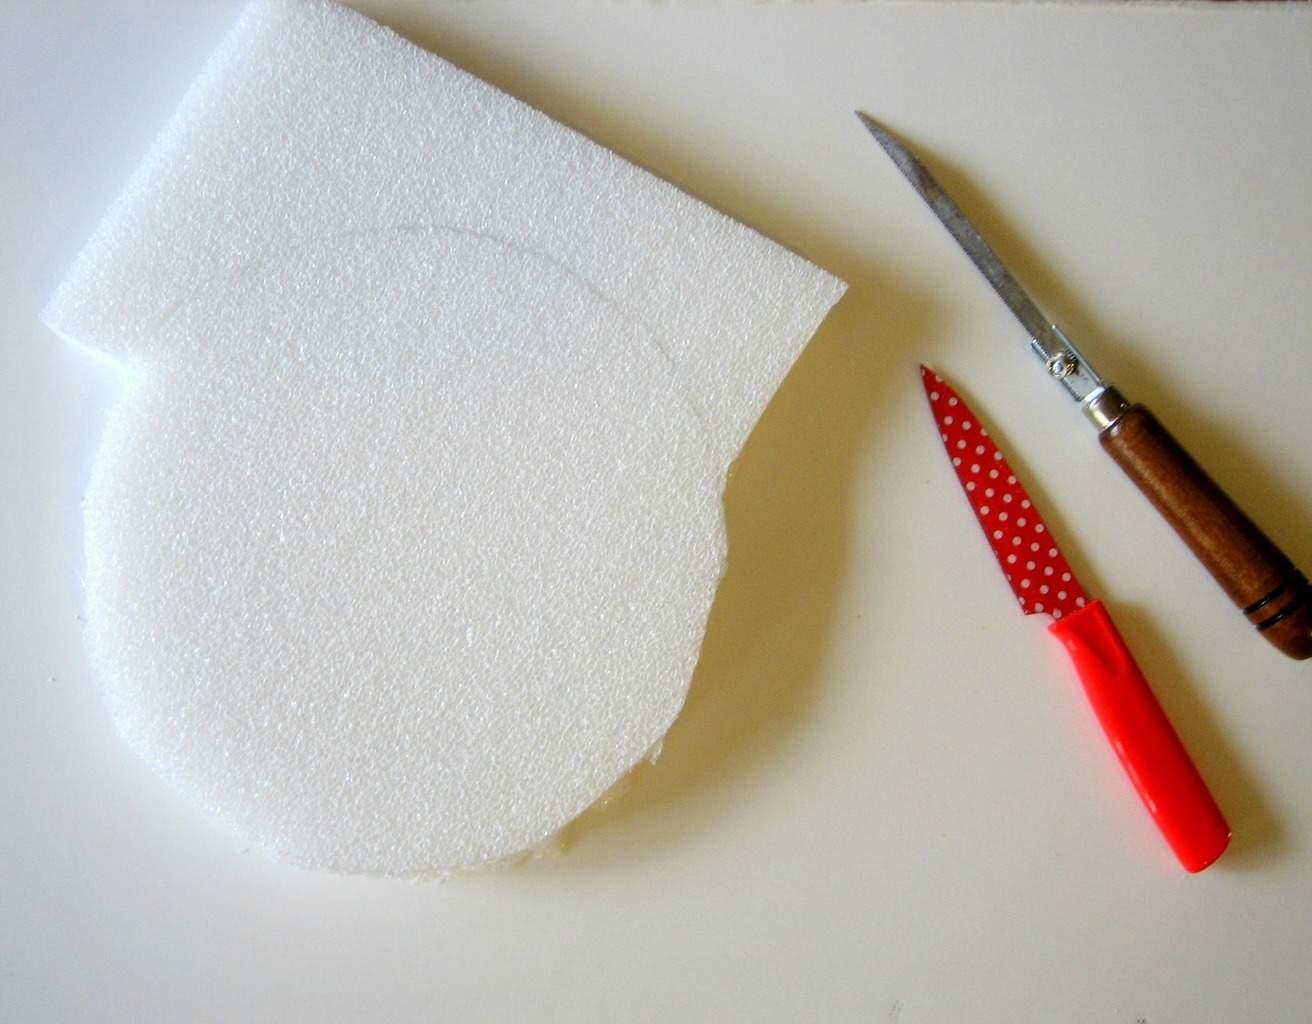 Cut foam board with a sharp knife